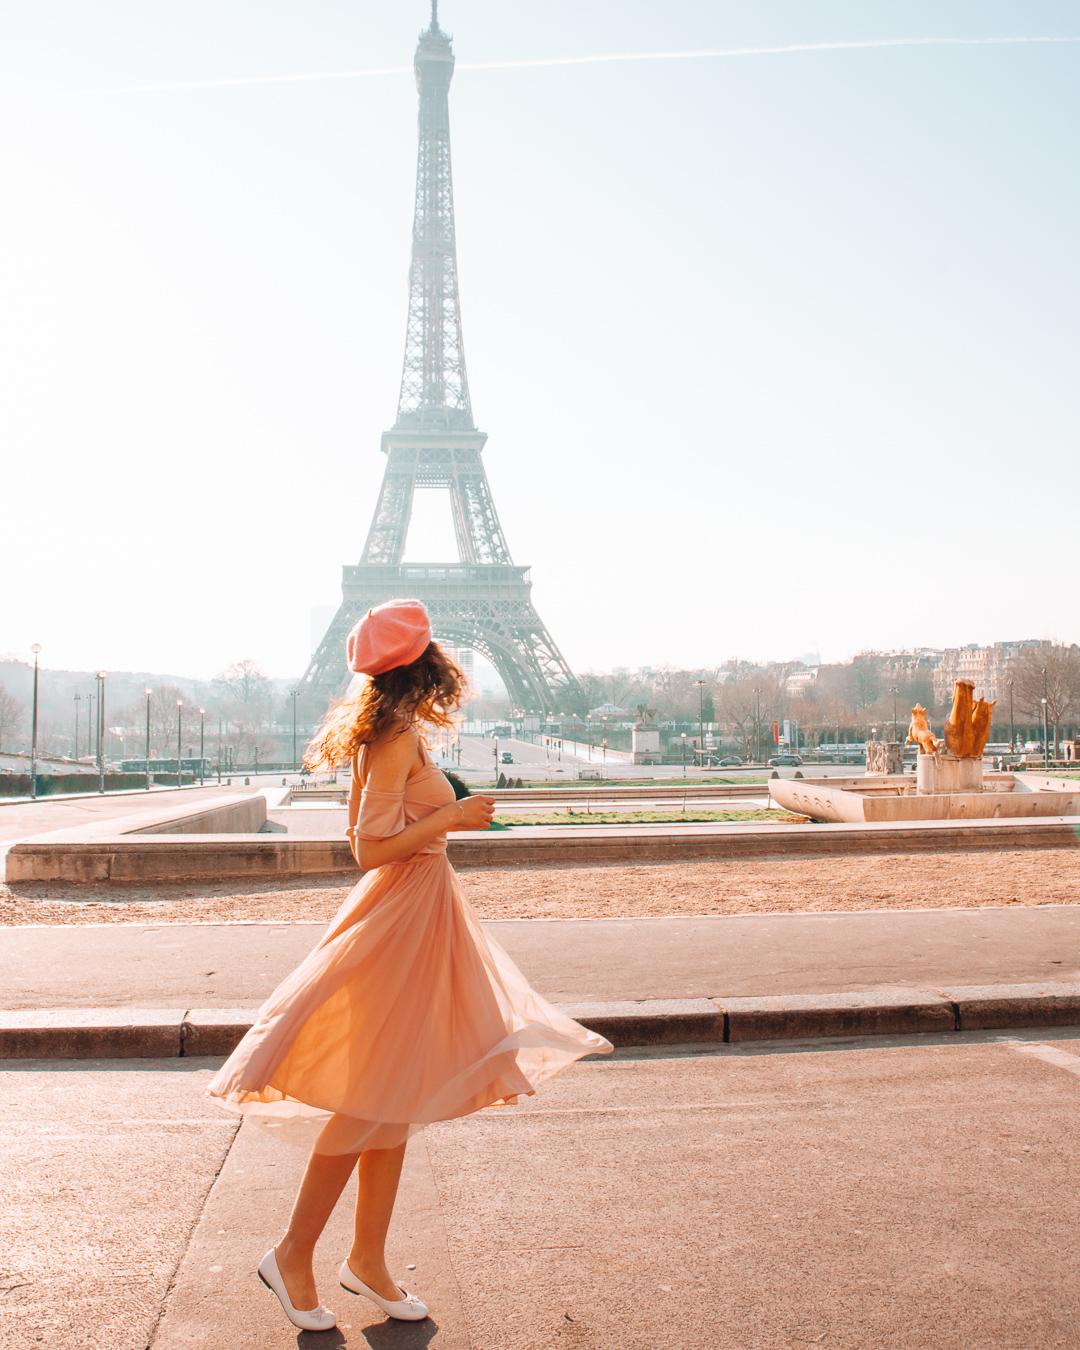 Girl with dress at Trocadéro